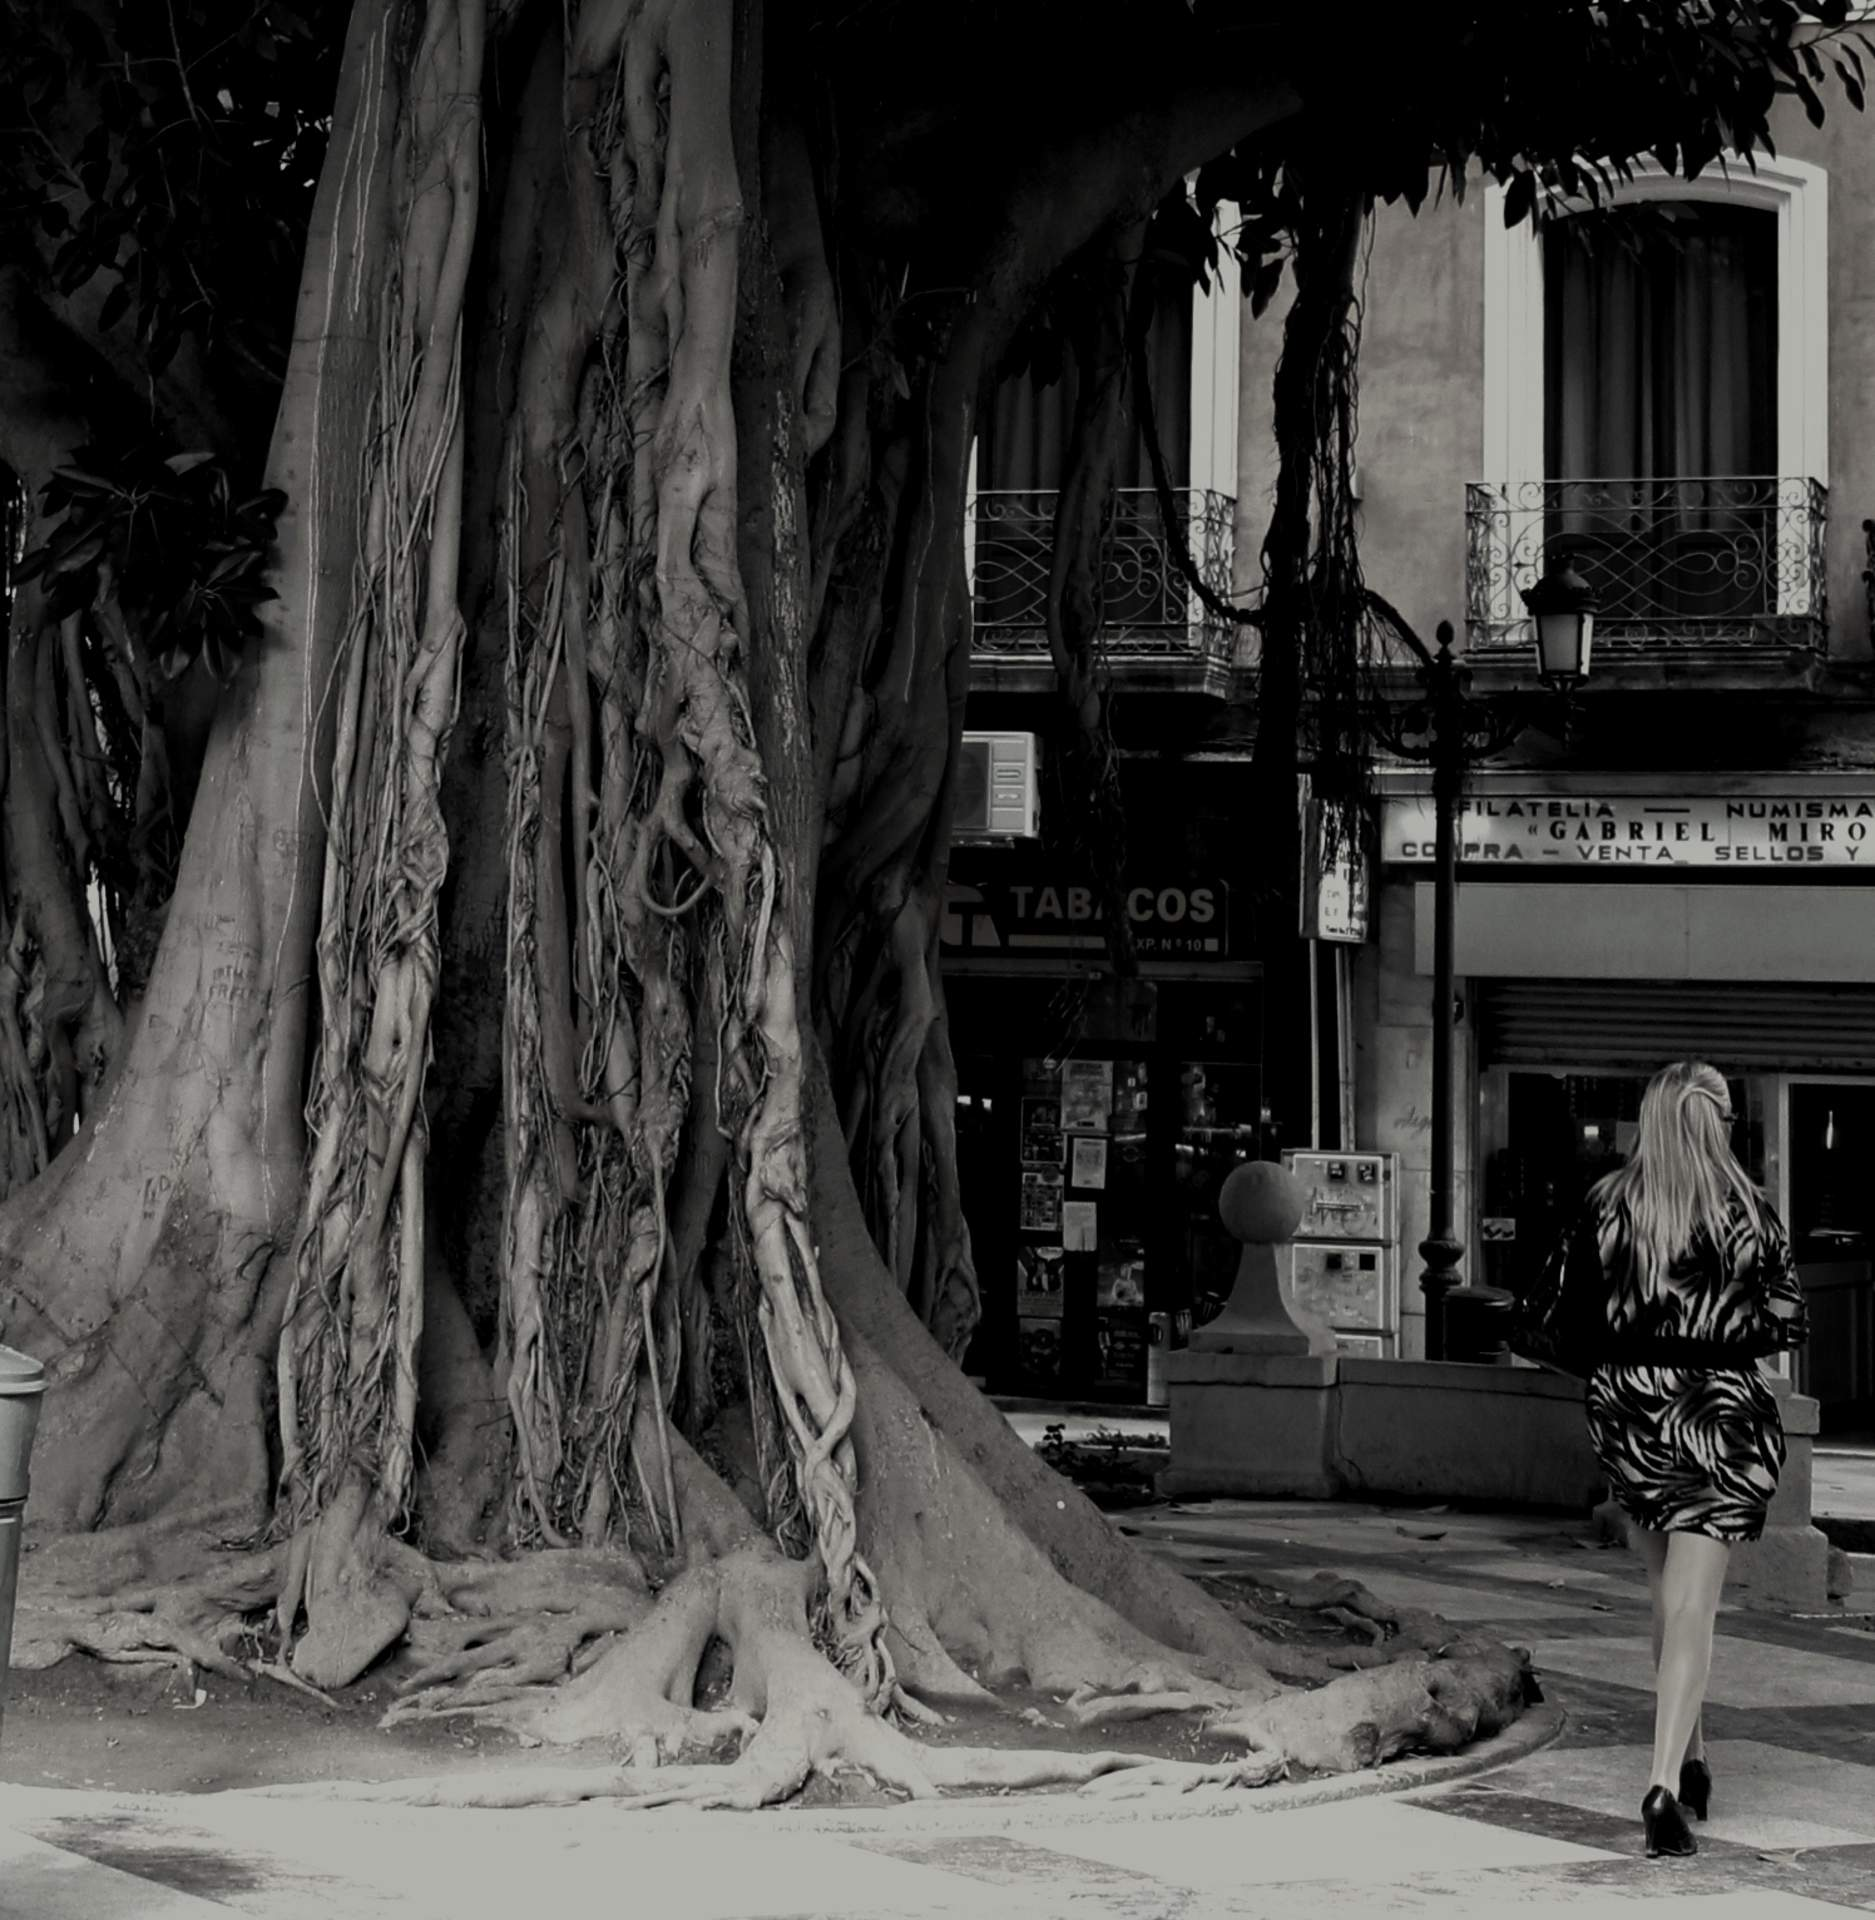 Tree in Costa Blanca